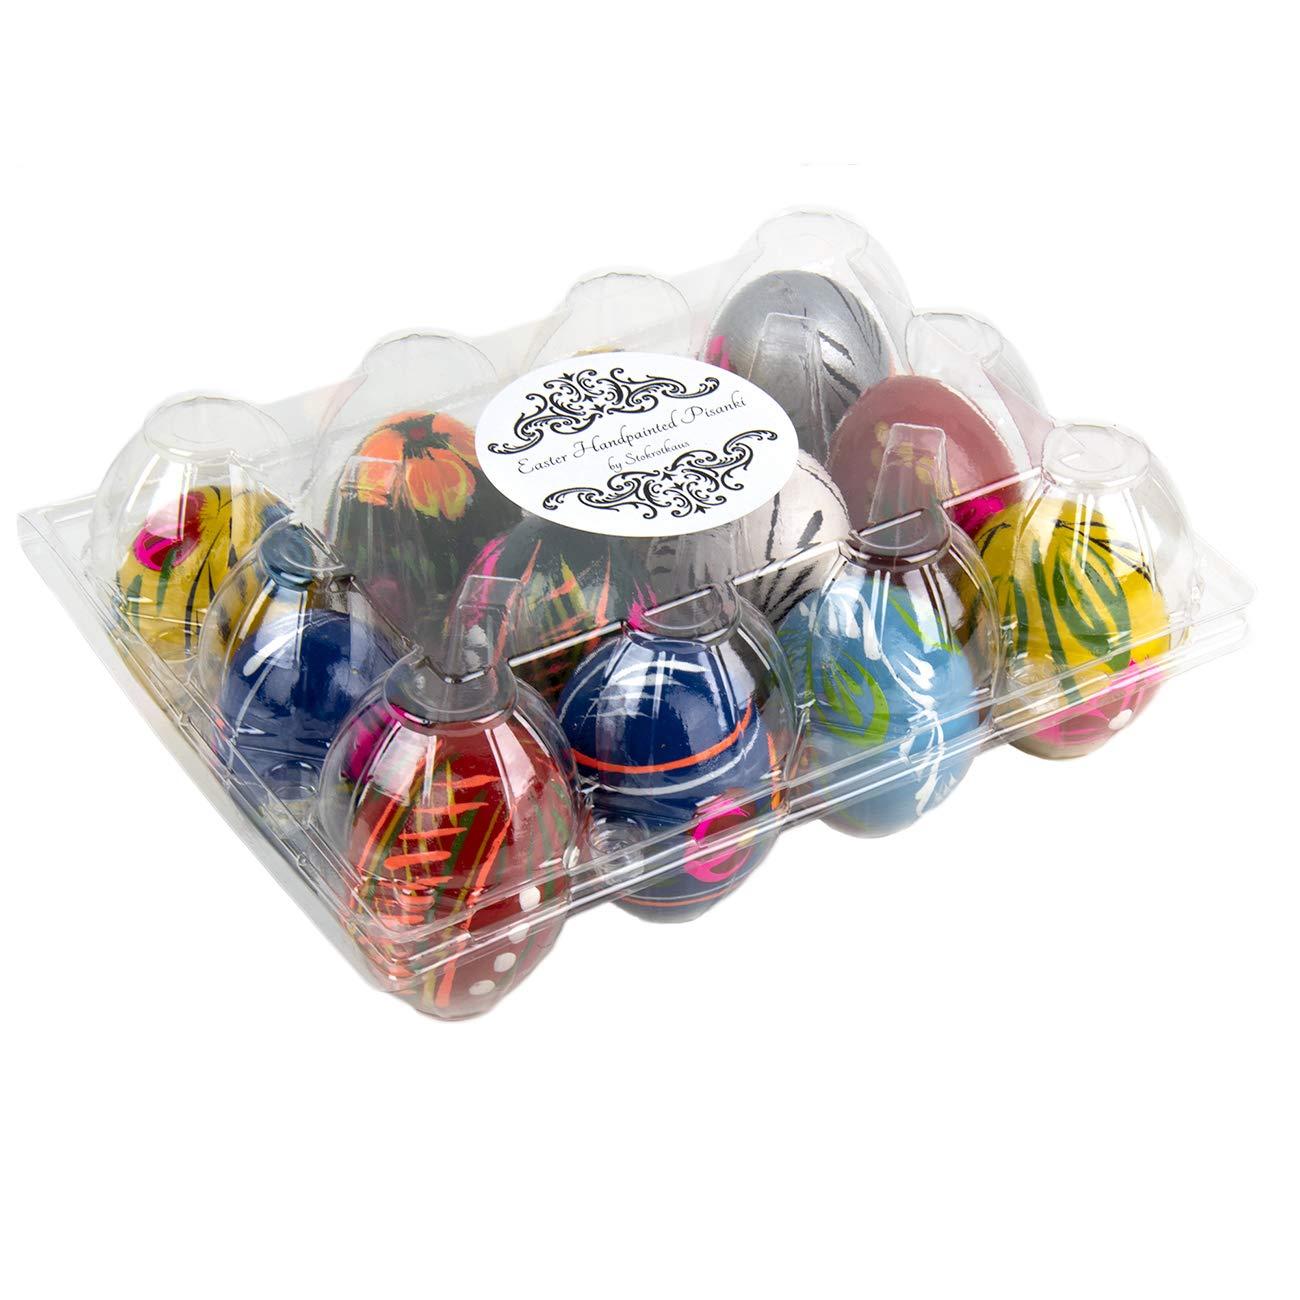 STOKROTKAUS Wooden Easter Pisanki Polish Painted Decorative Eggs in Box 12